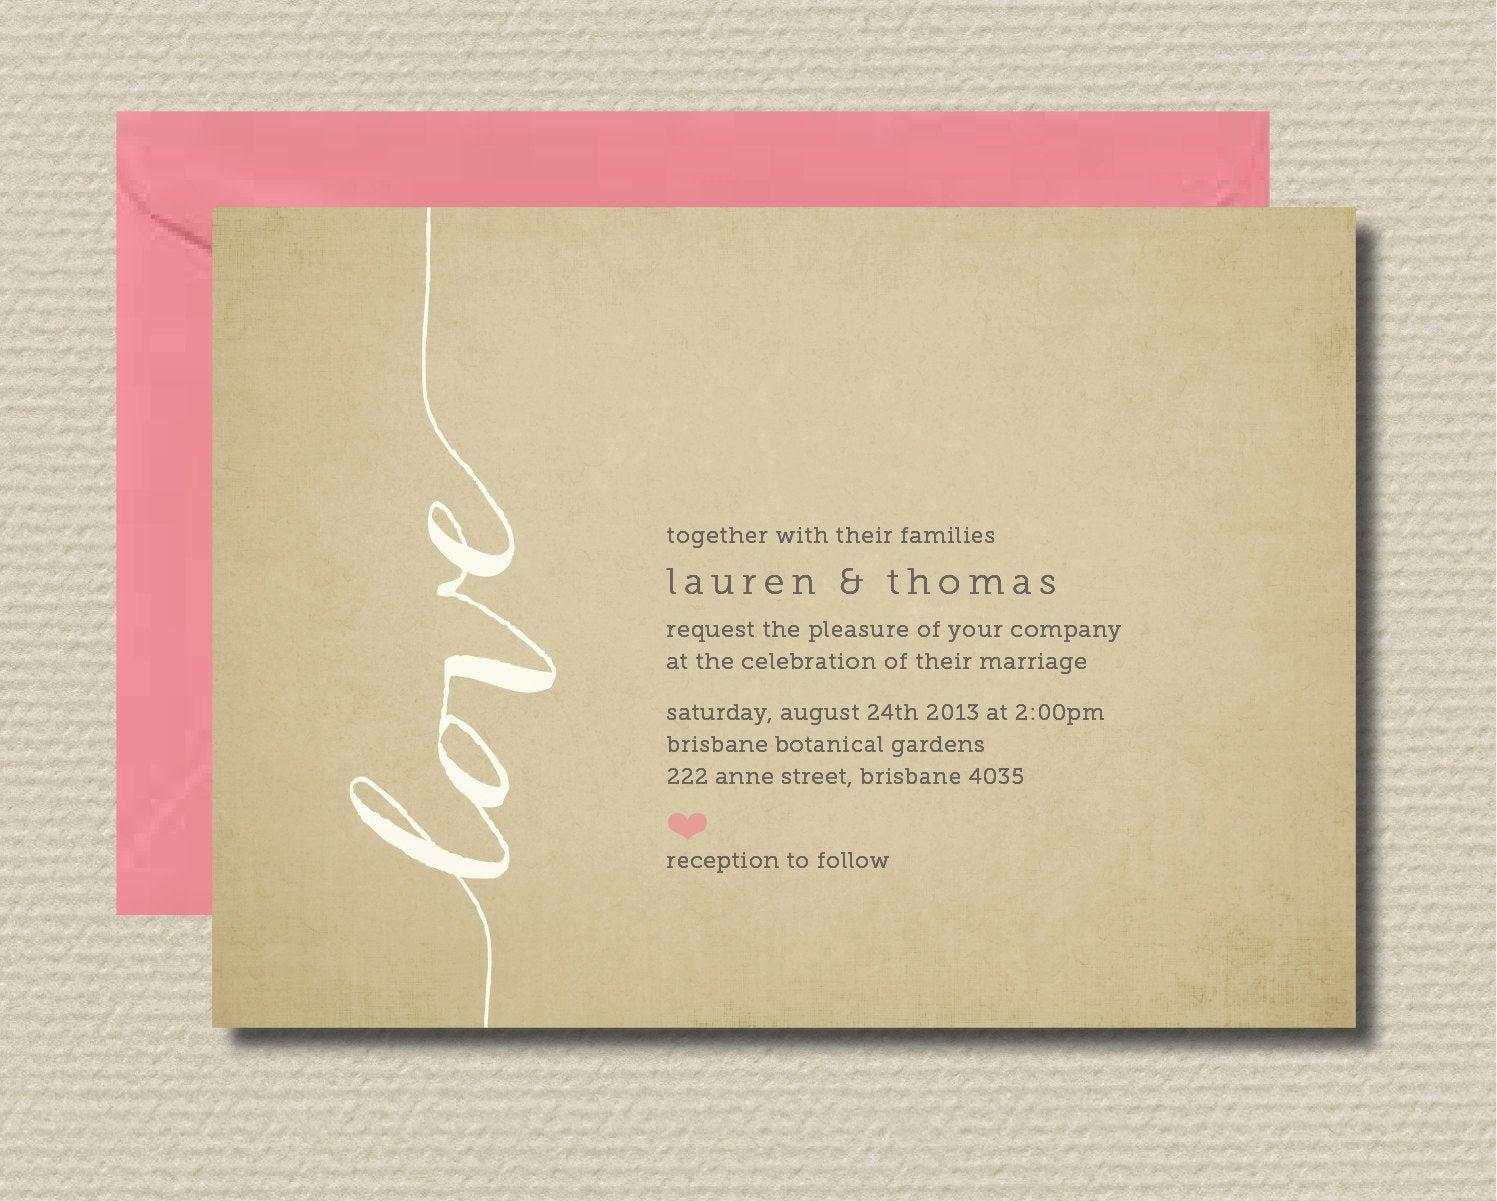 Rsvp Wedding Invitation Wording Best Of Printable Wedding Invitation & Rsvp Love by Rosiedaydesign